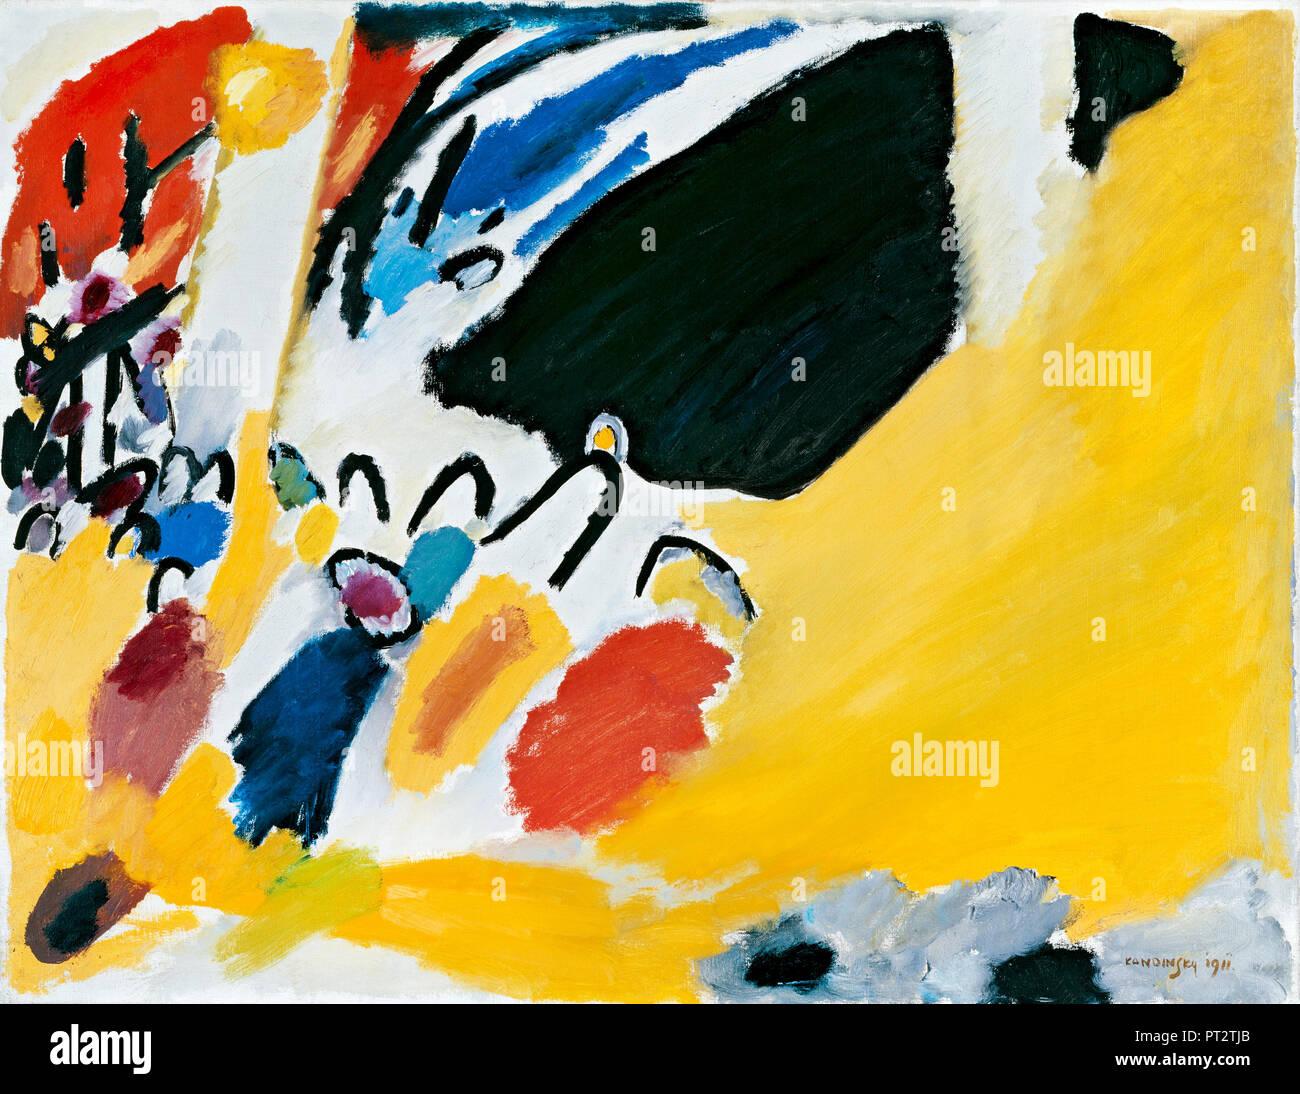 Wassily Kandinsky, Impression III, Concert 1911 Huile sur toile, Staedtische galerie dans Lenbachhaus Kunstbau, et l'Allemagne. Photo Stock